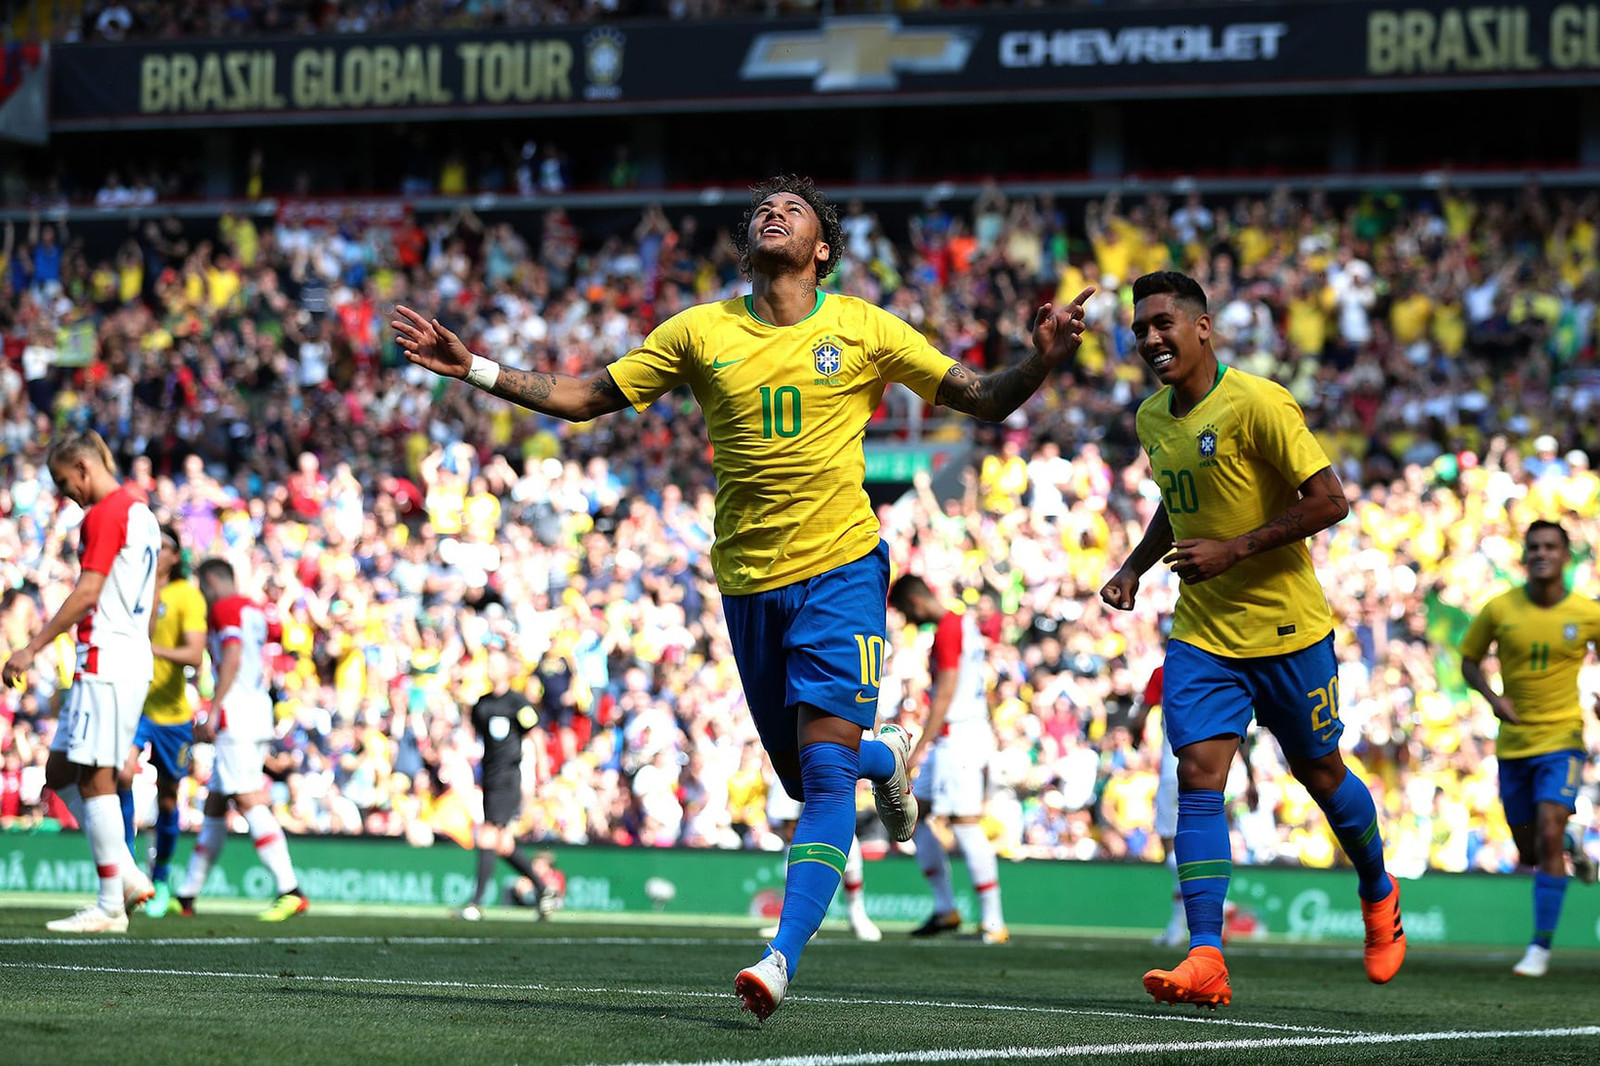 2018-world-cup-guide-brazil-neymar